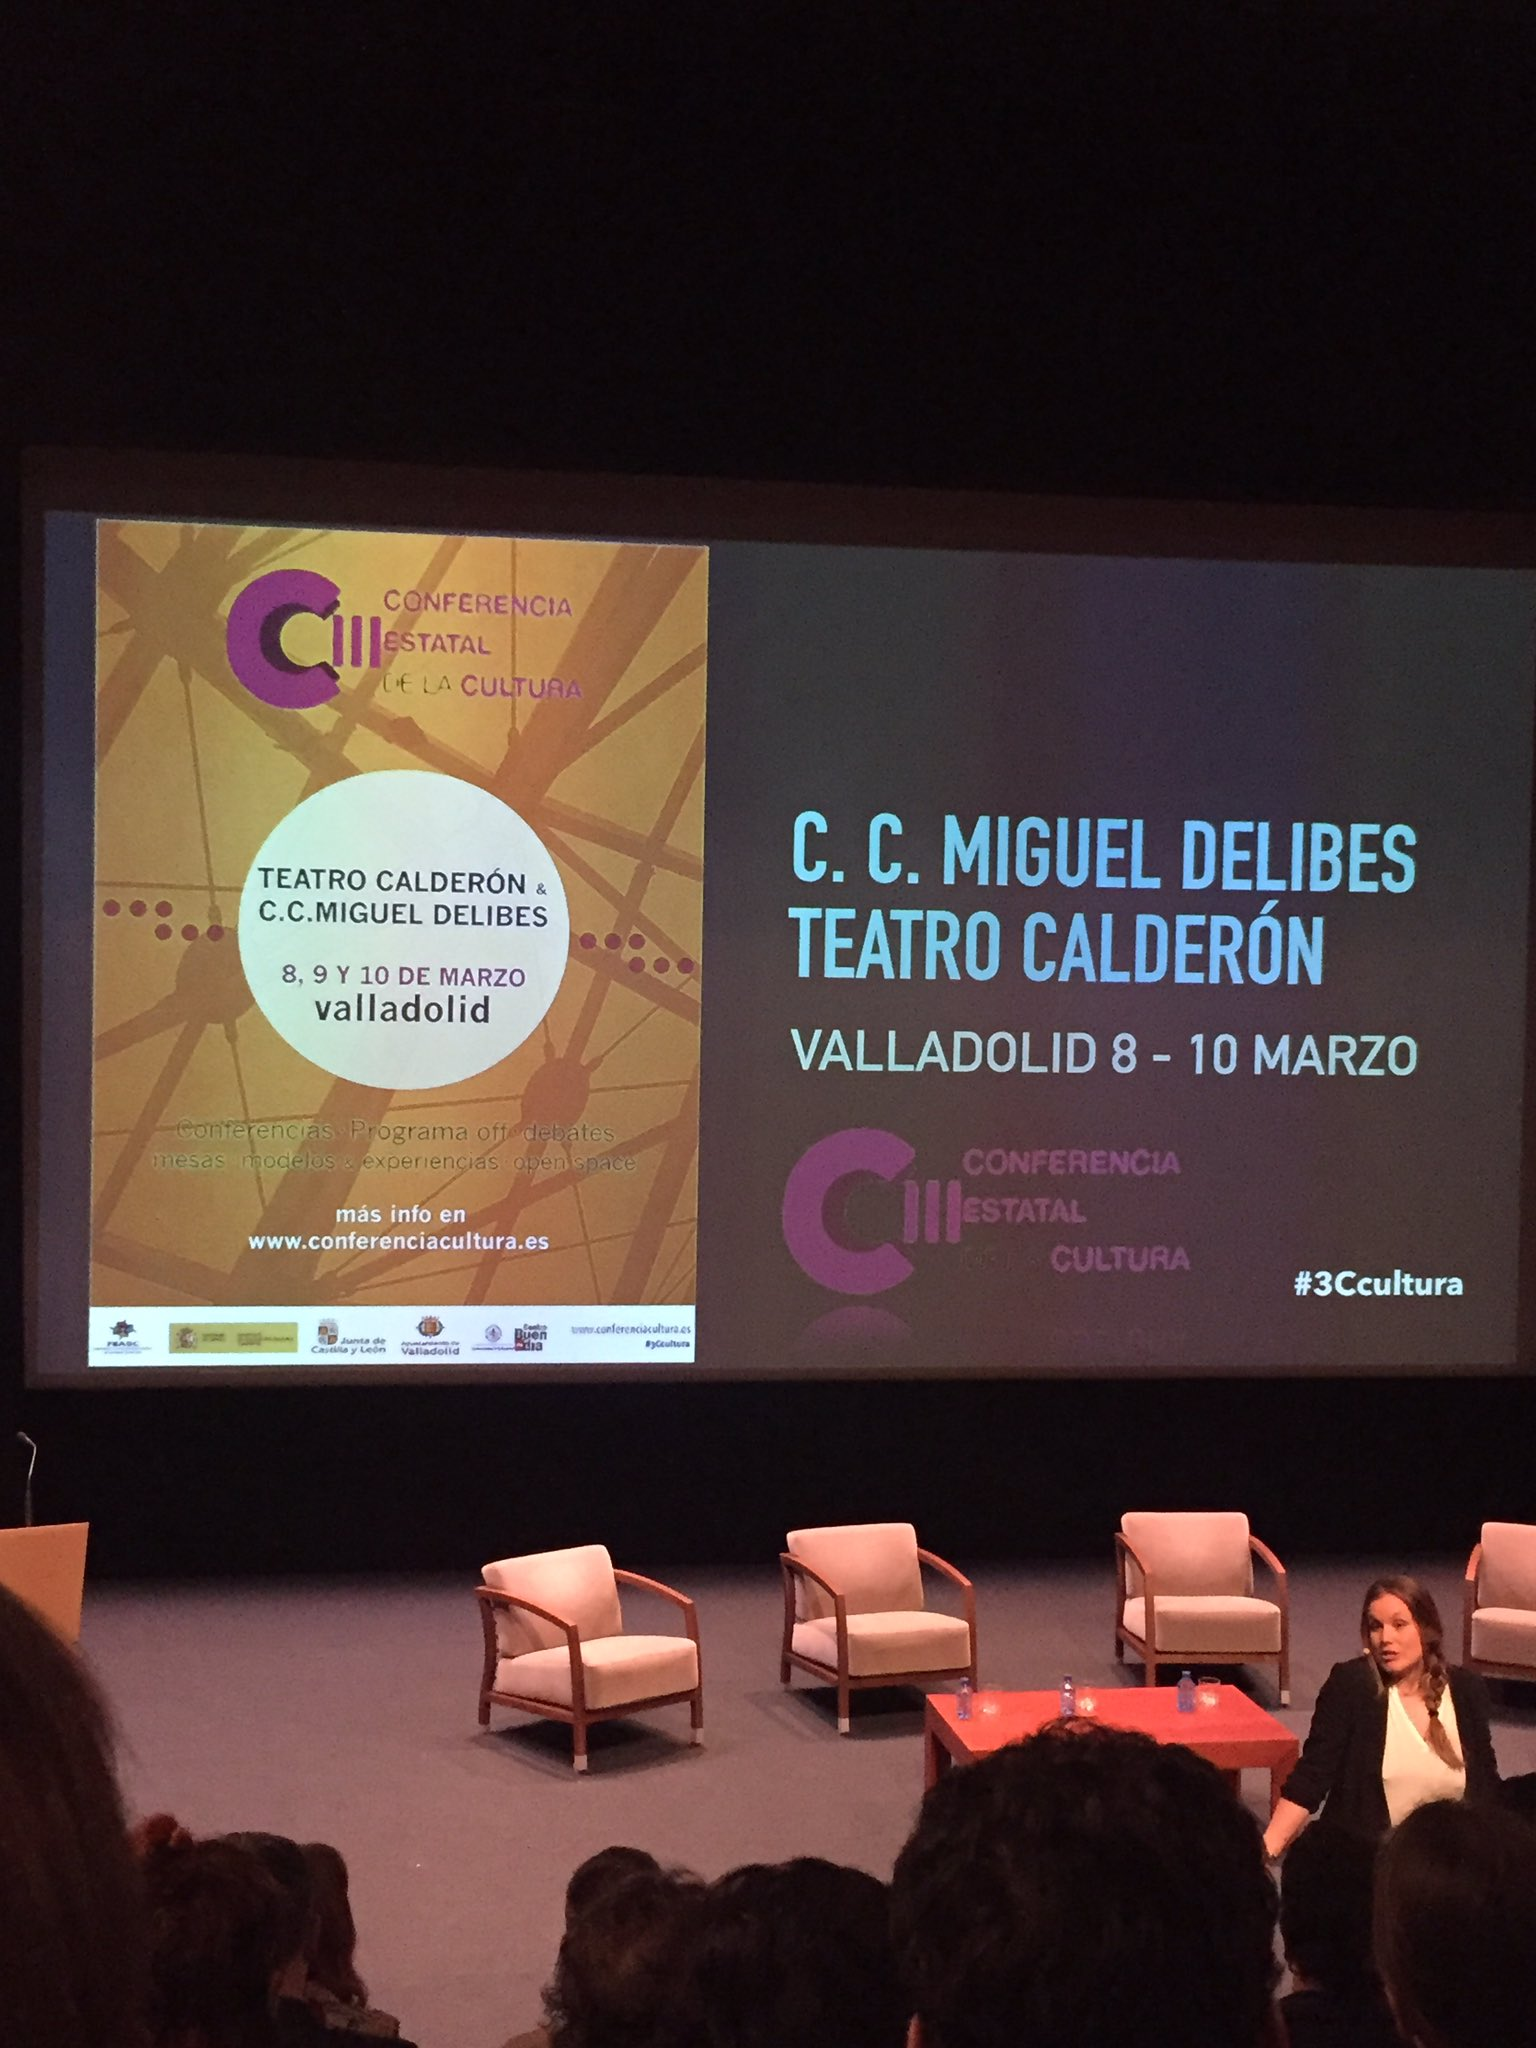 Comenzando!! @CCMDCyL @GesCulCyL III Conferencia Estatal de #Cultura #3Ccultura @anabel_sierra https://t.co/iCZkpvGqBj